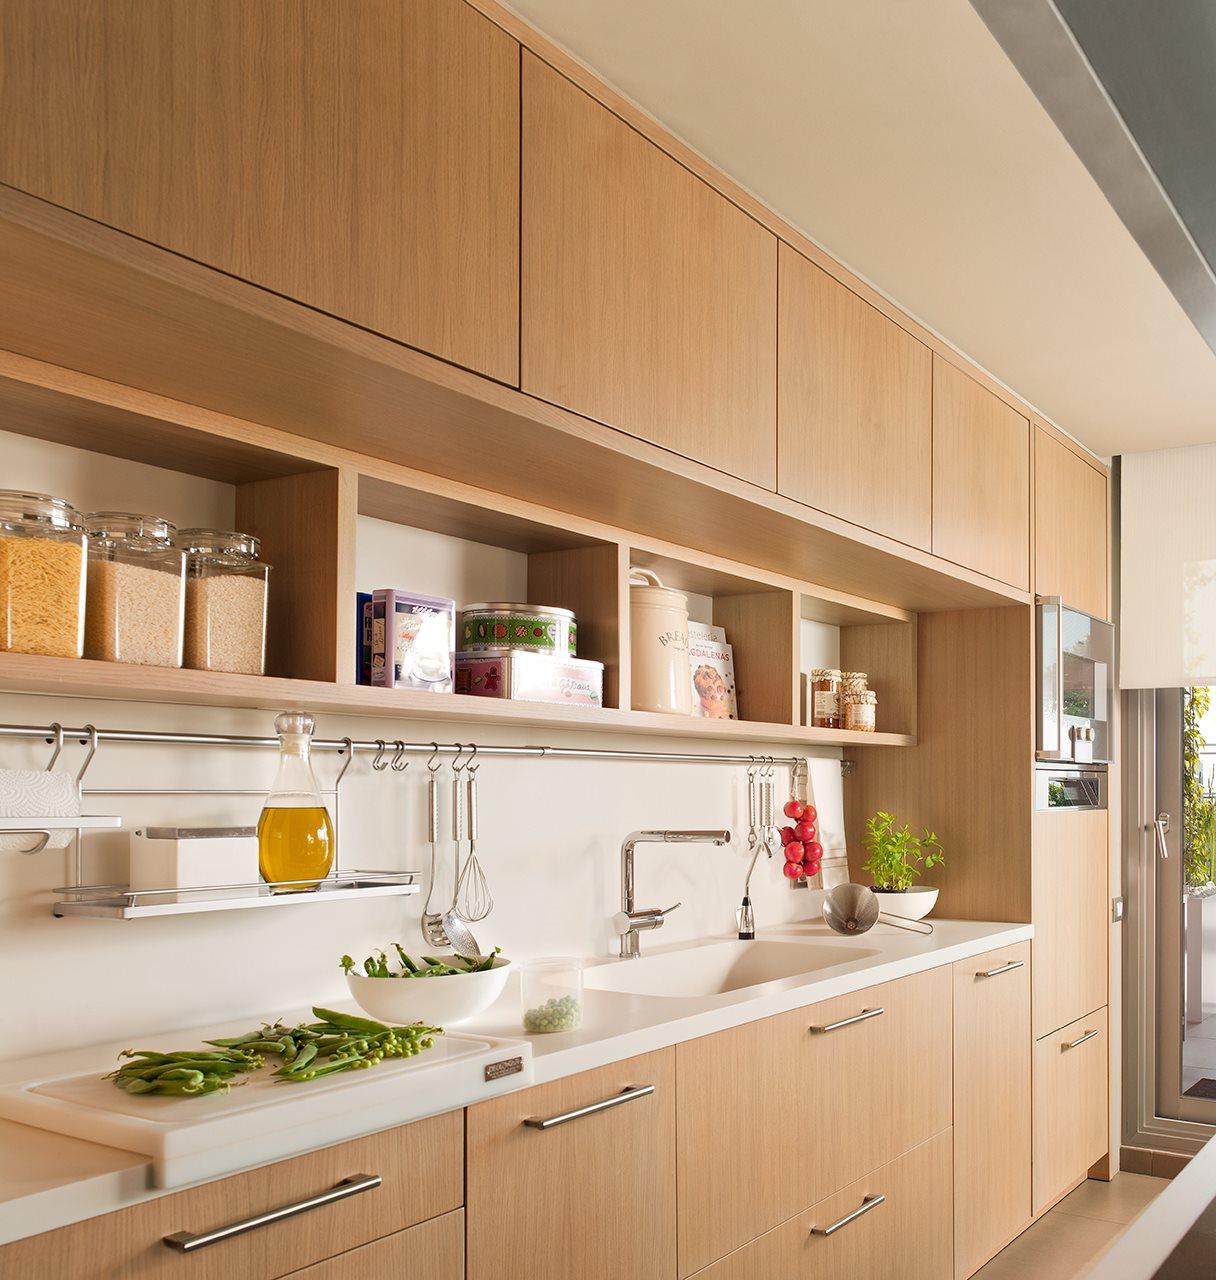 C mo aprovechar el espacio en cocinas peque as for Bar para cocina